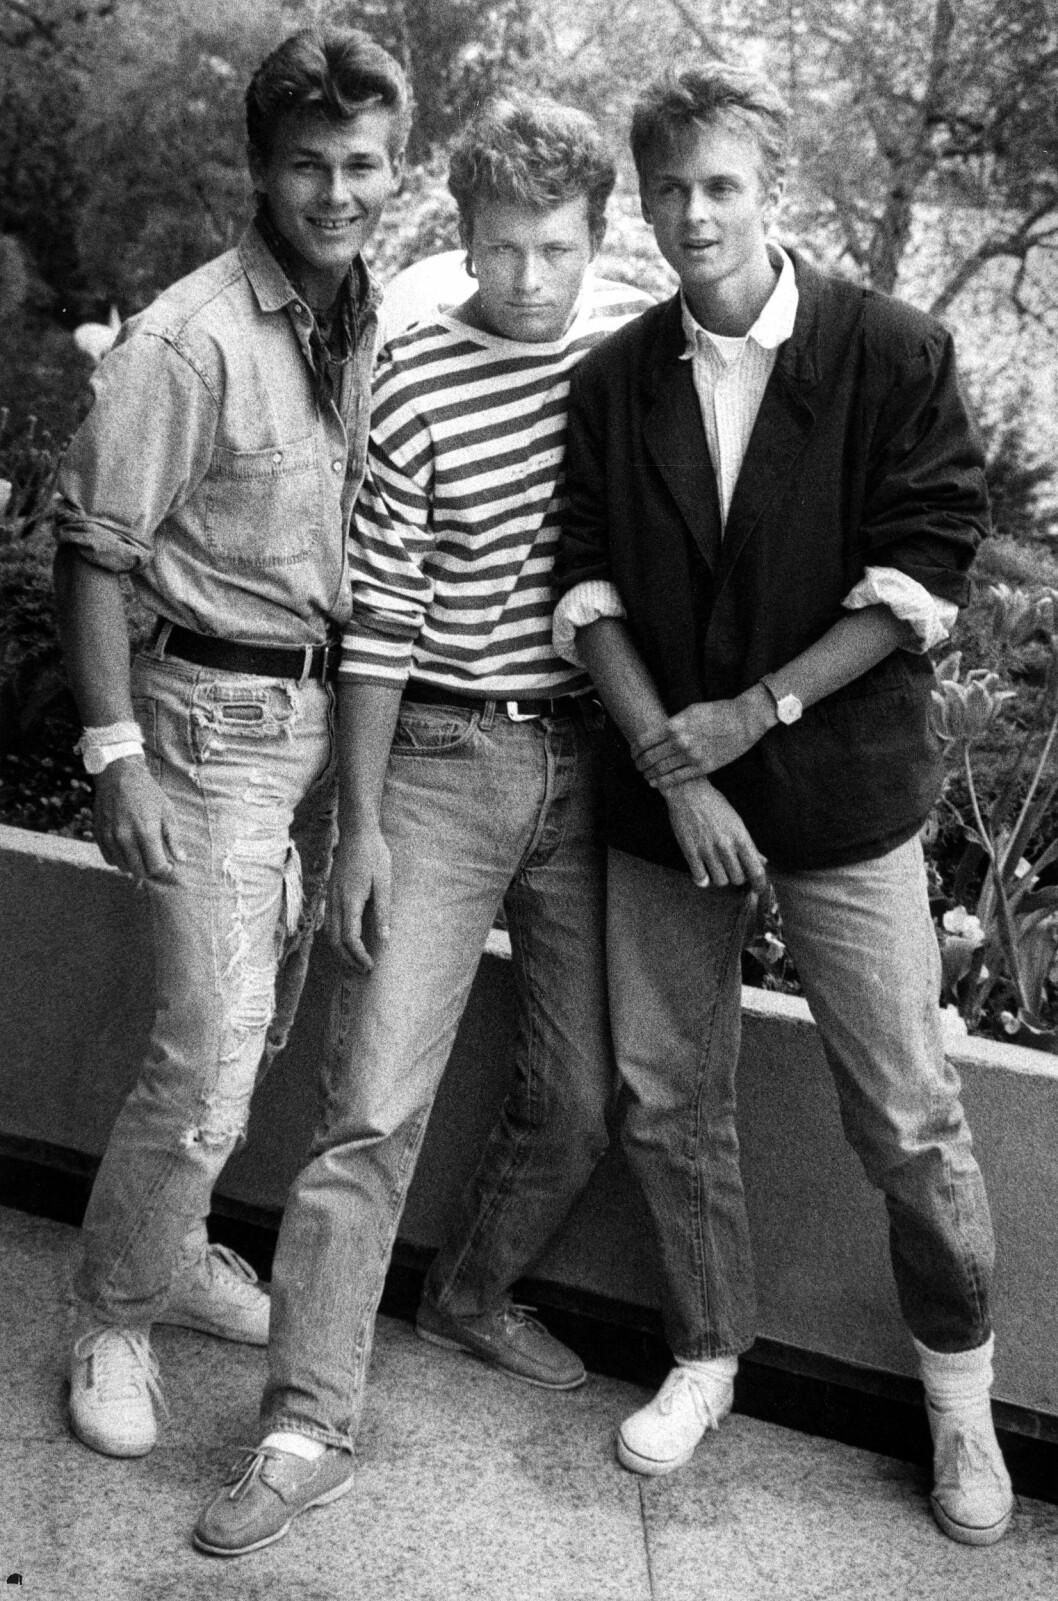 <strong>UNGPIKEIDOLER:</strong> Den norske musikkgruppen a-ha fotografert i 1987. Fra venstre: Morten Harket, Morten Furuholmen og Paul Waaktaar-Savoy. Foto: Erik Poppe for VG / NTB Scanpix